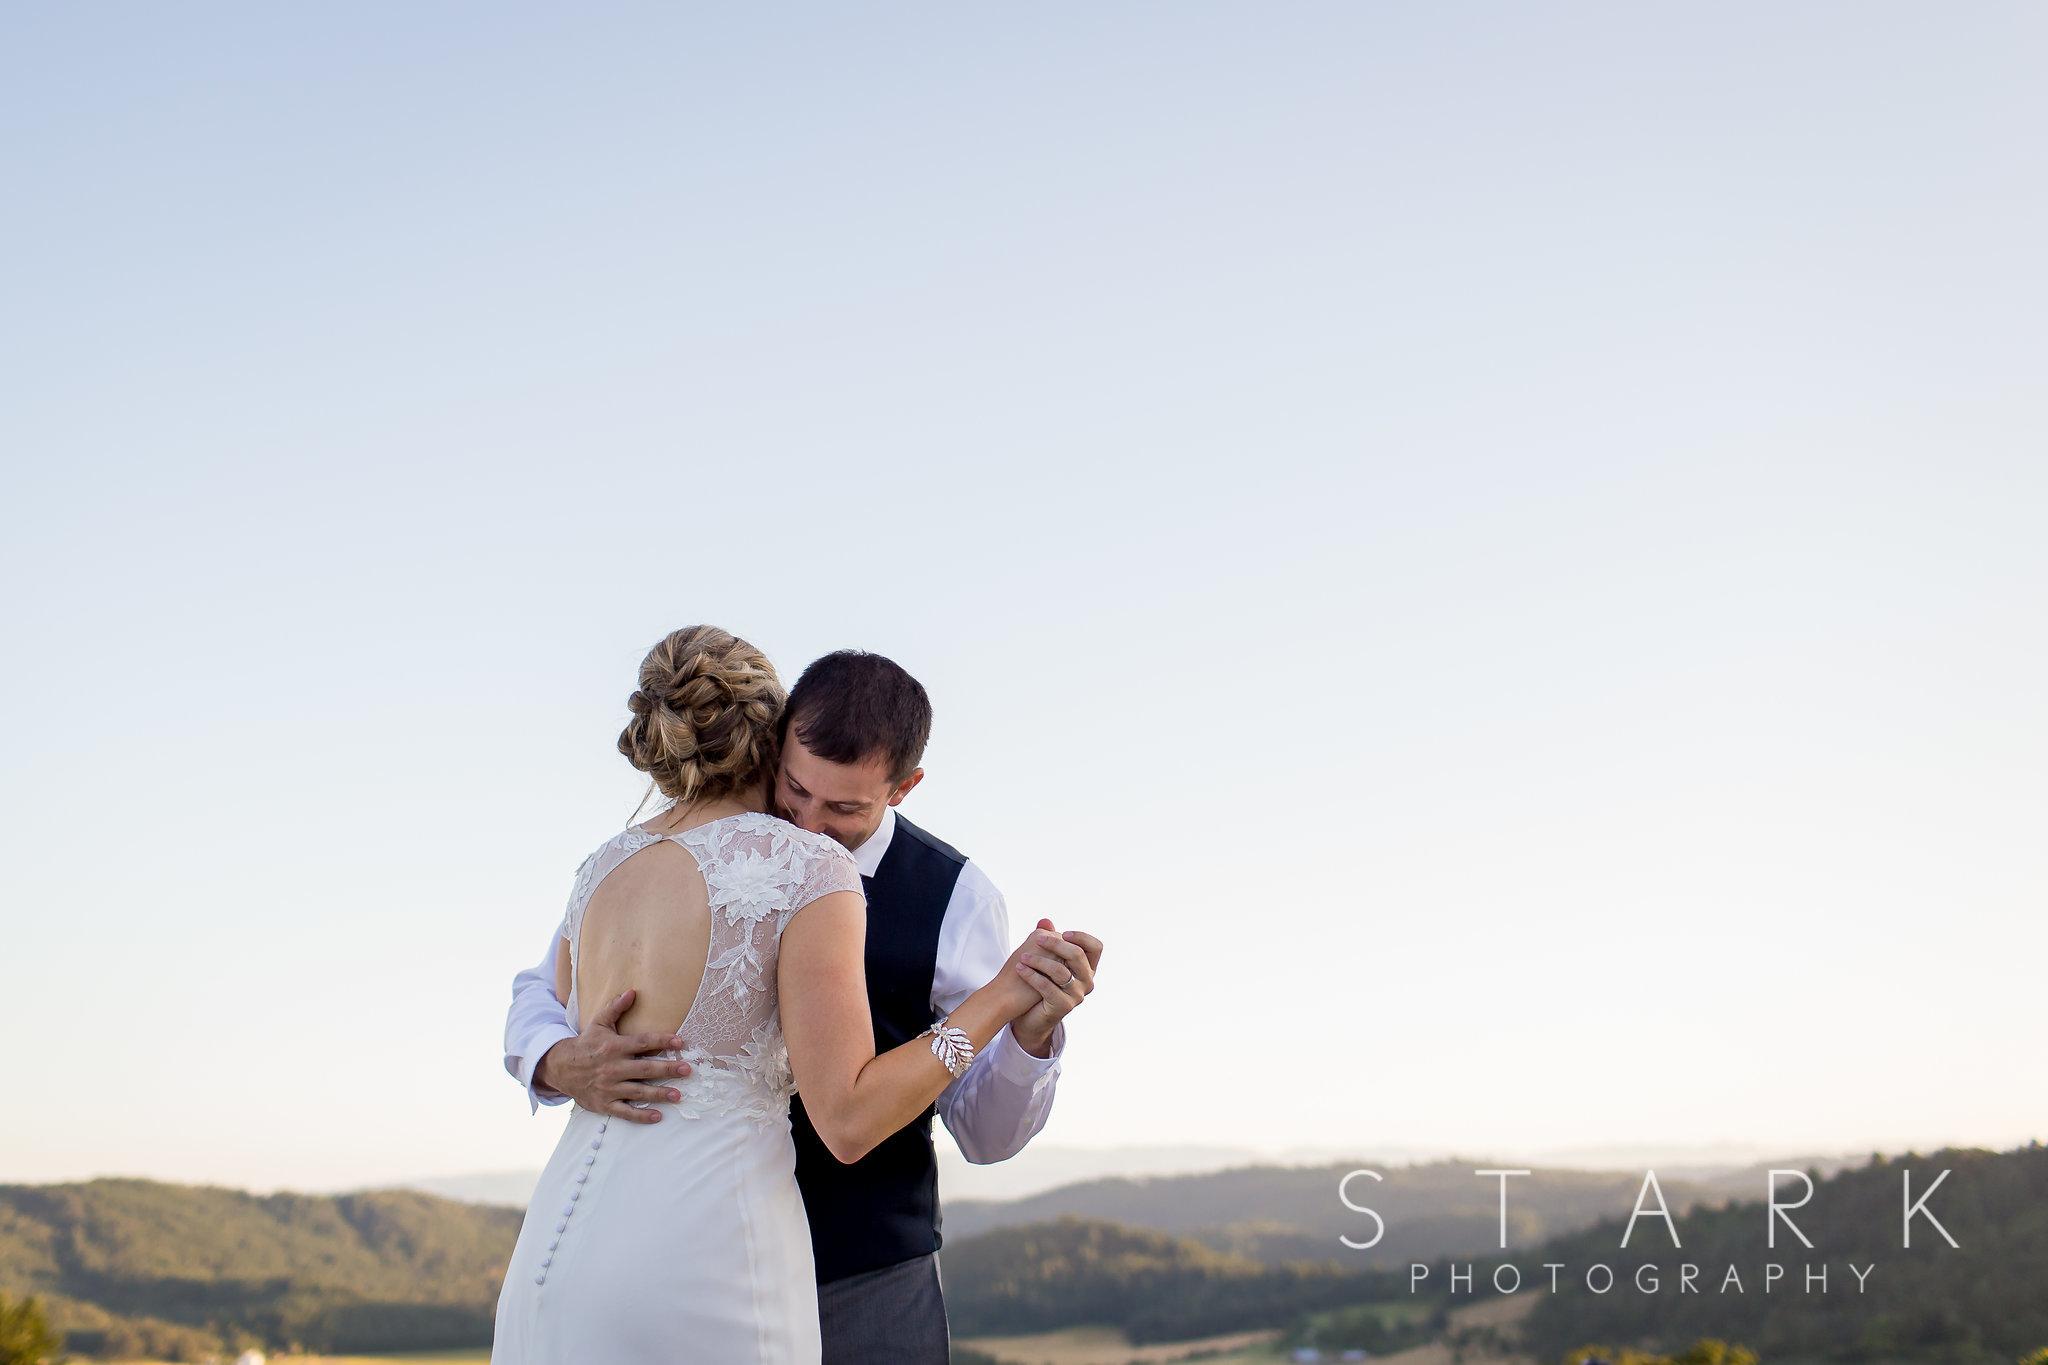 Bridalbliss.com | Portland Wedding | Oregon Event Planning and Design |  Stark PhotographyBridalbliss.com | Portland Wedding | Oregon Event Planning and Design |  Stark Photography